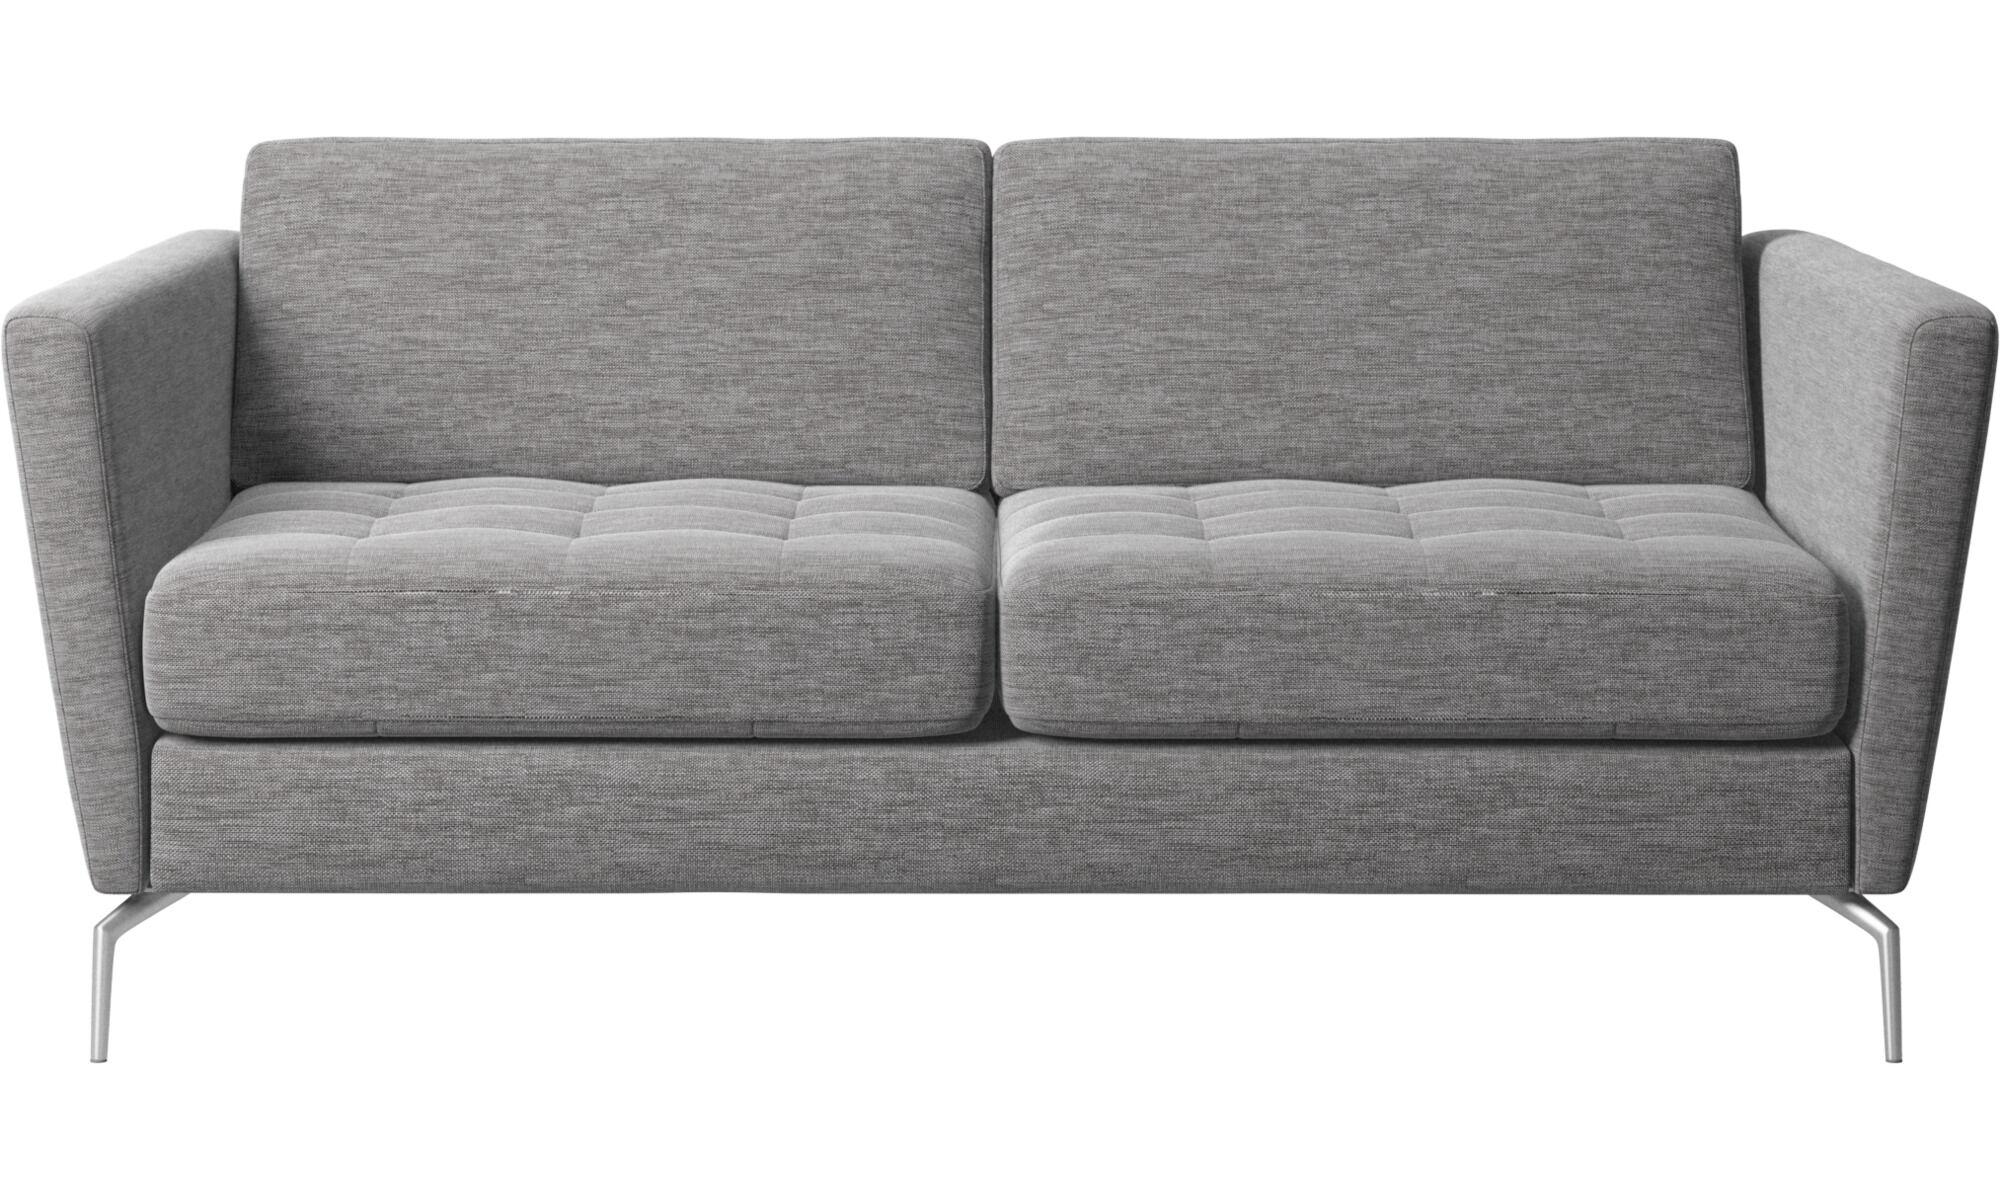 New Designs   Osaka Sofa, Tufted Seat   Gray   Fabric